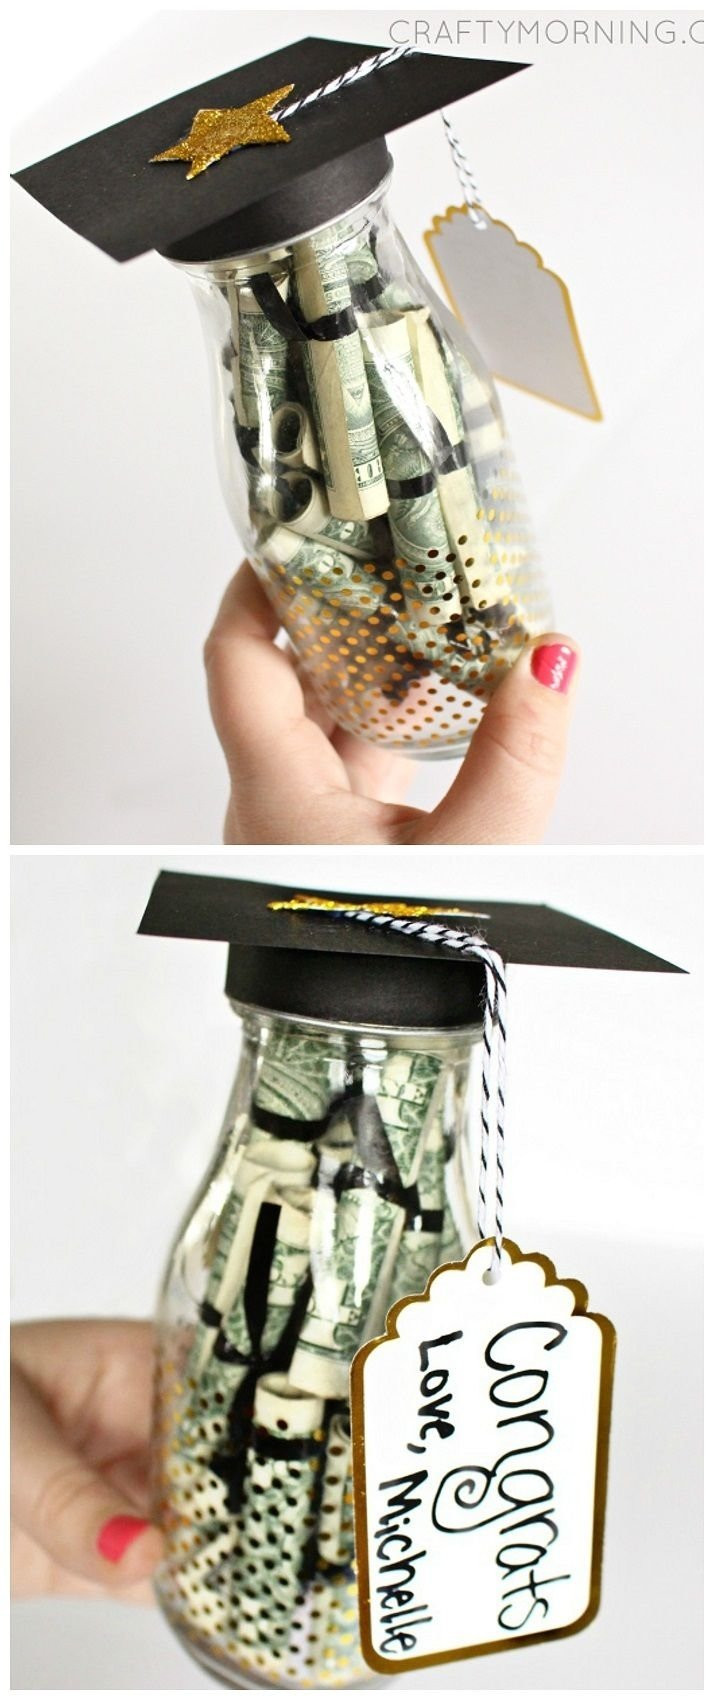 Nursing Graduation Gift Ideas  10 Unique Nursing School Graduation Gift Ideas 2019